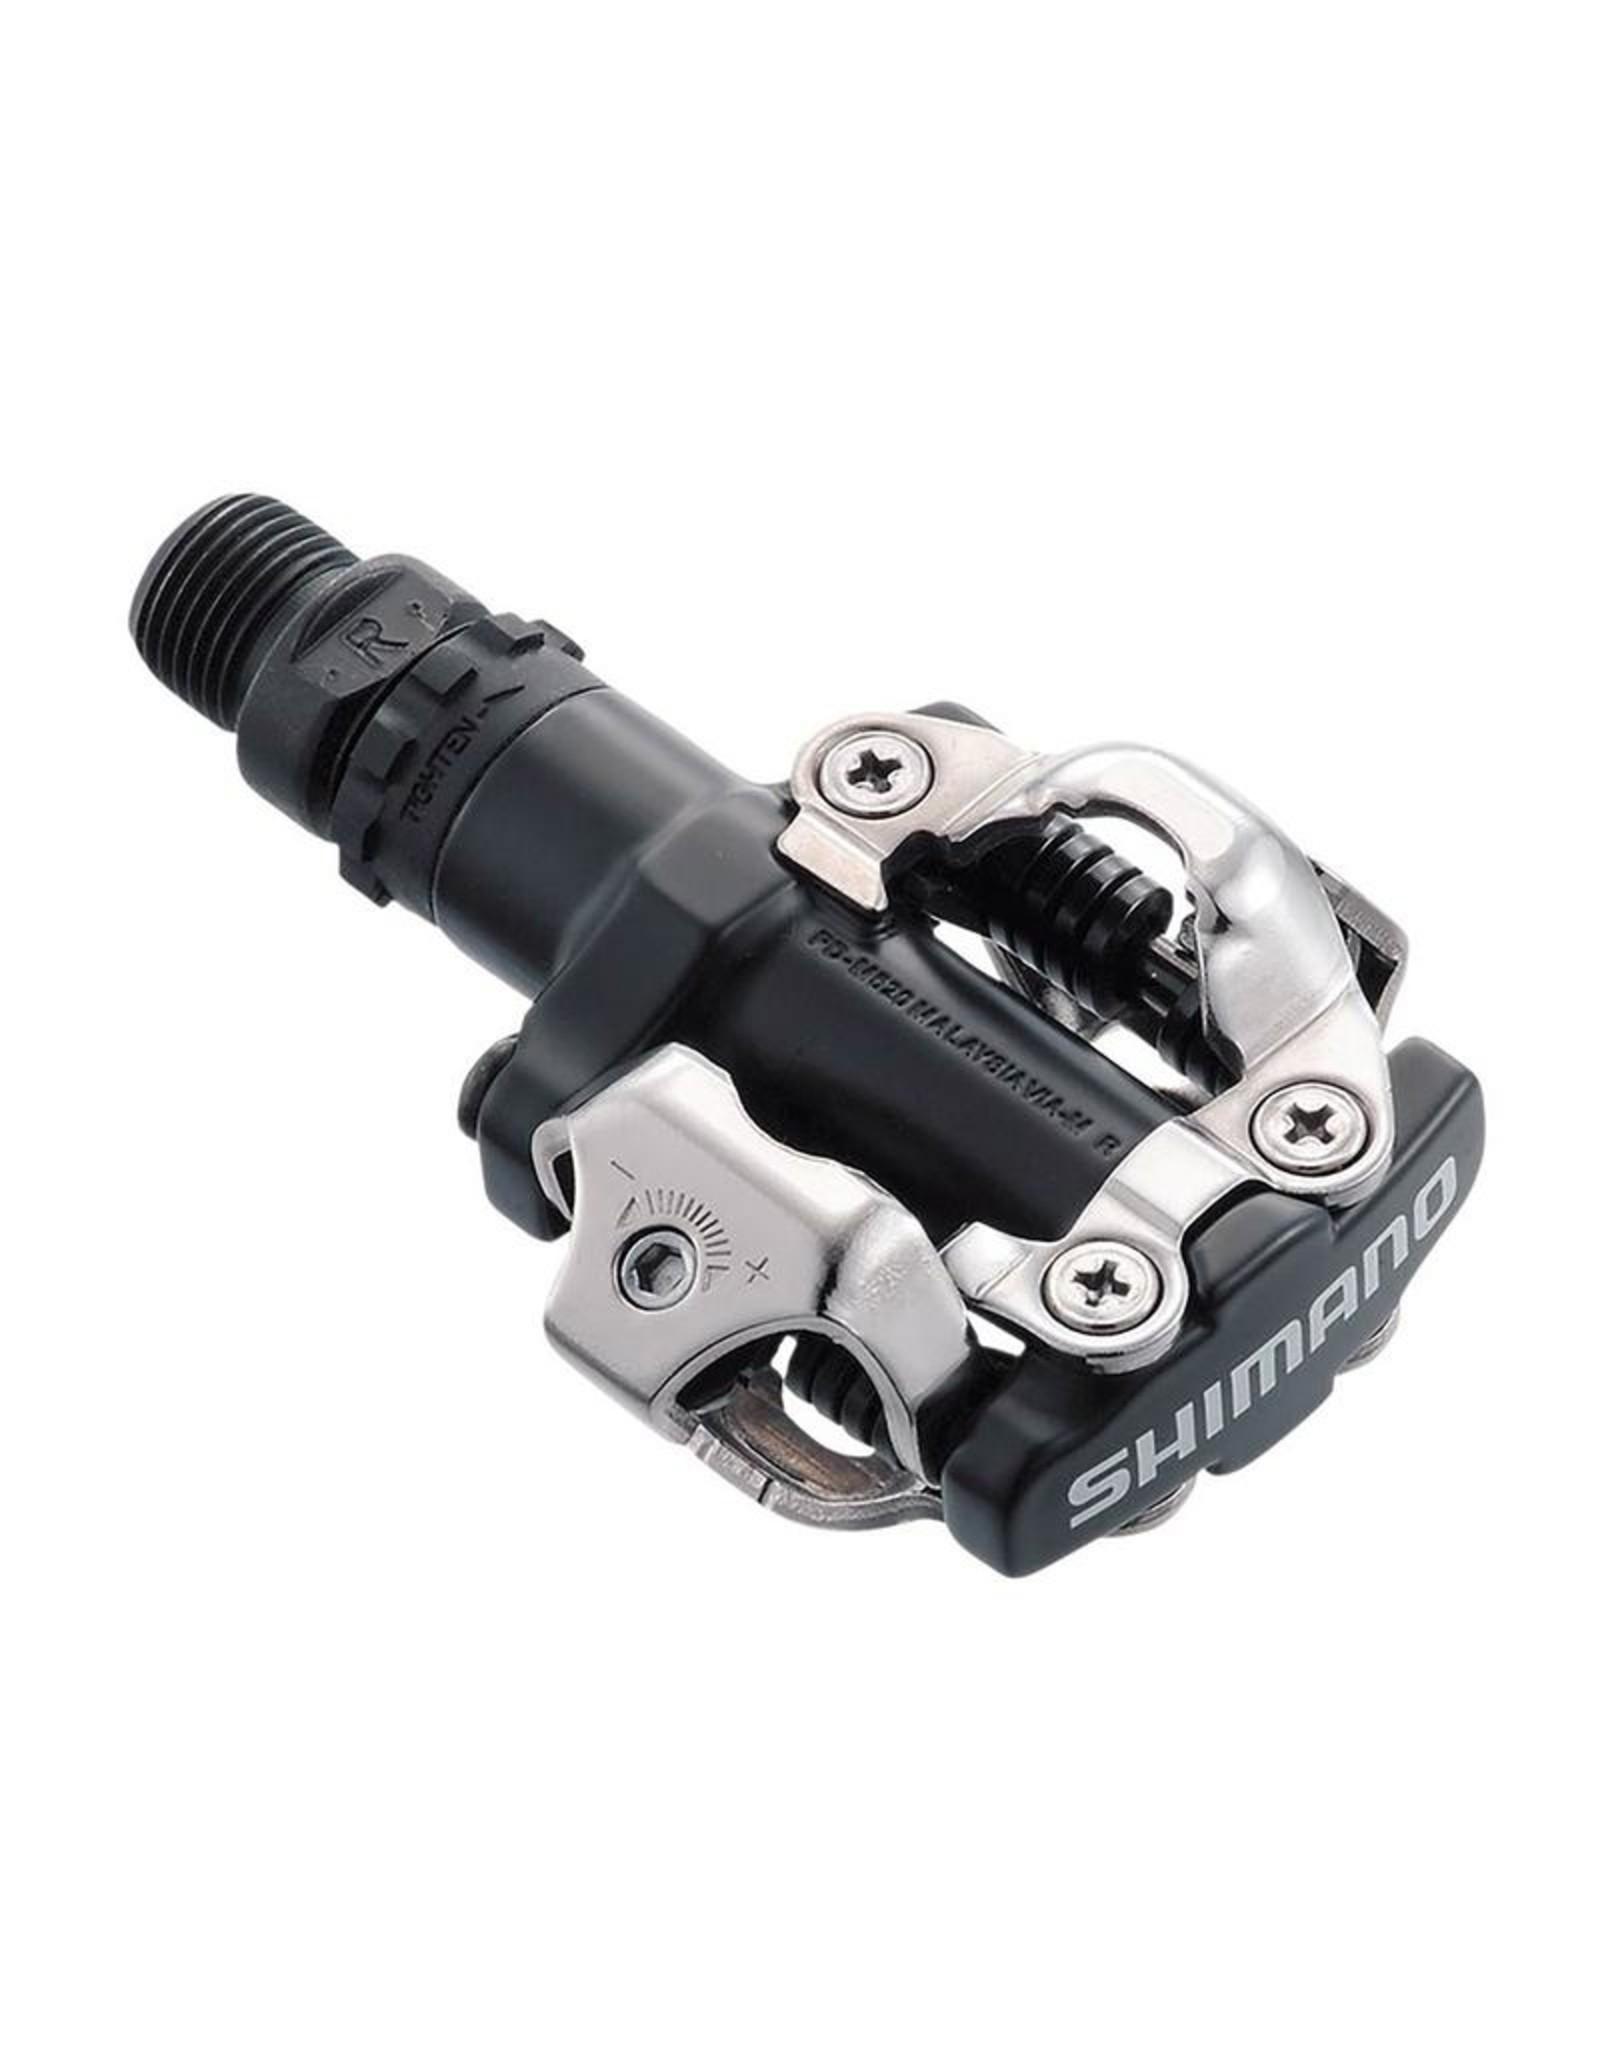 Shimano PD-M520L clipless pedals, black